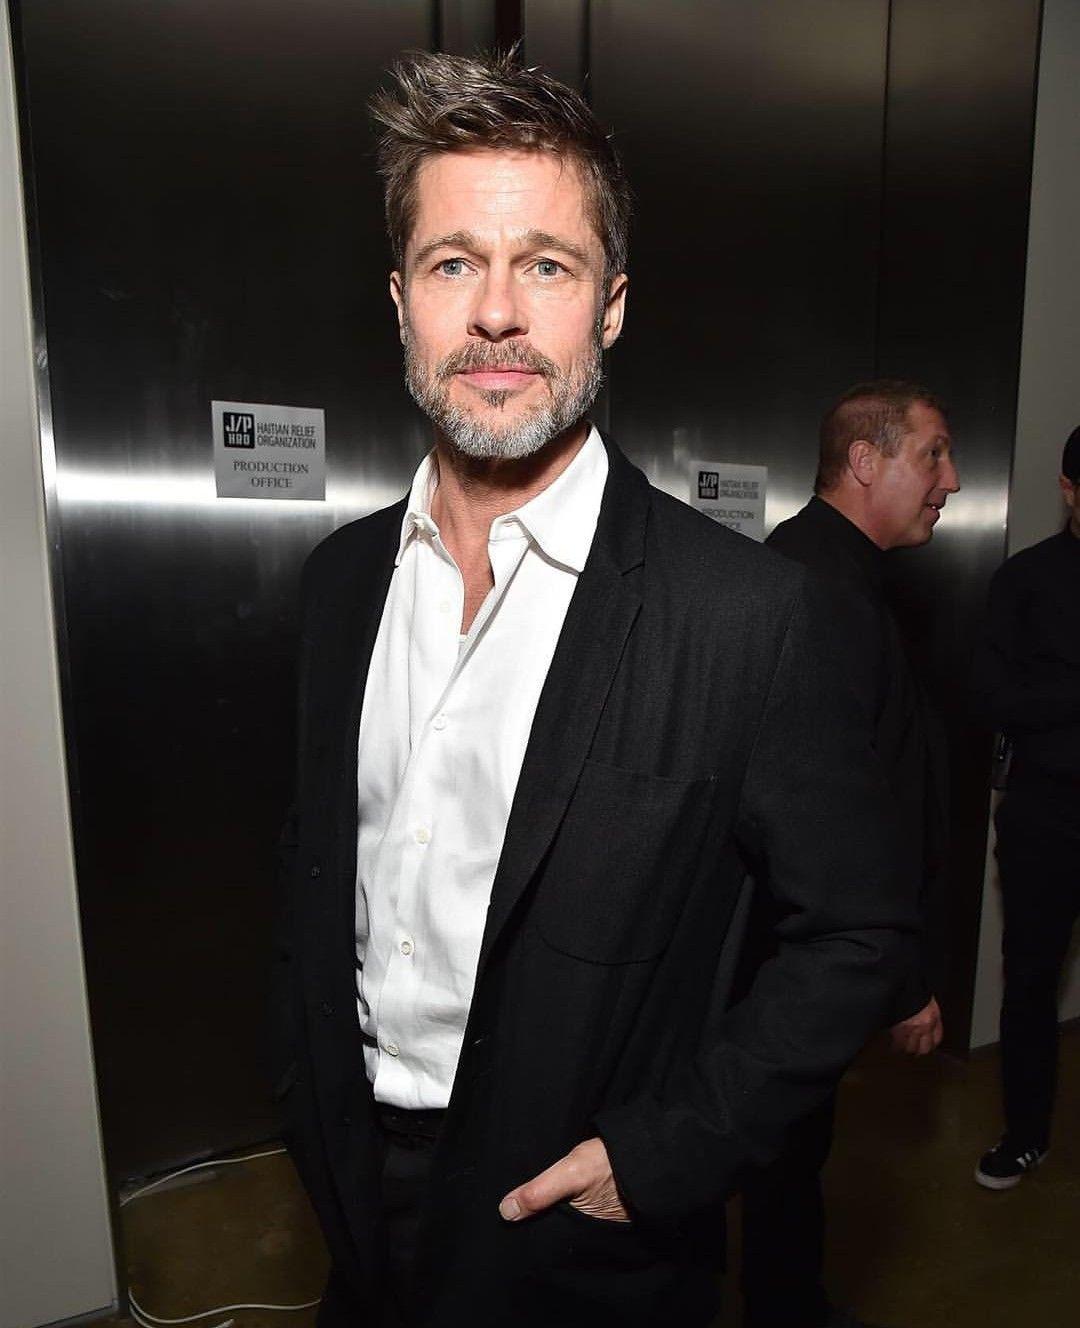 Pin by Angestics Fra on Brad Pitt in 2019